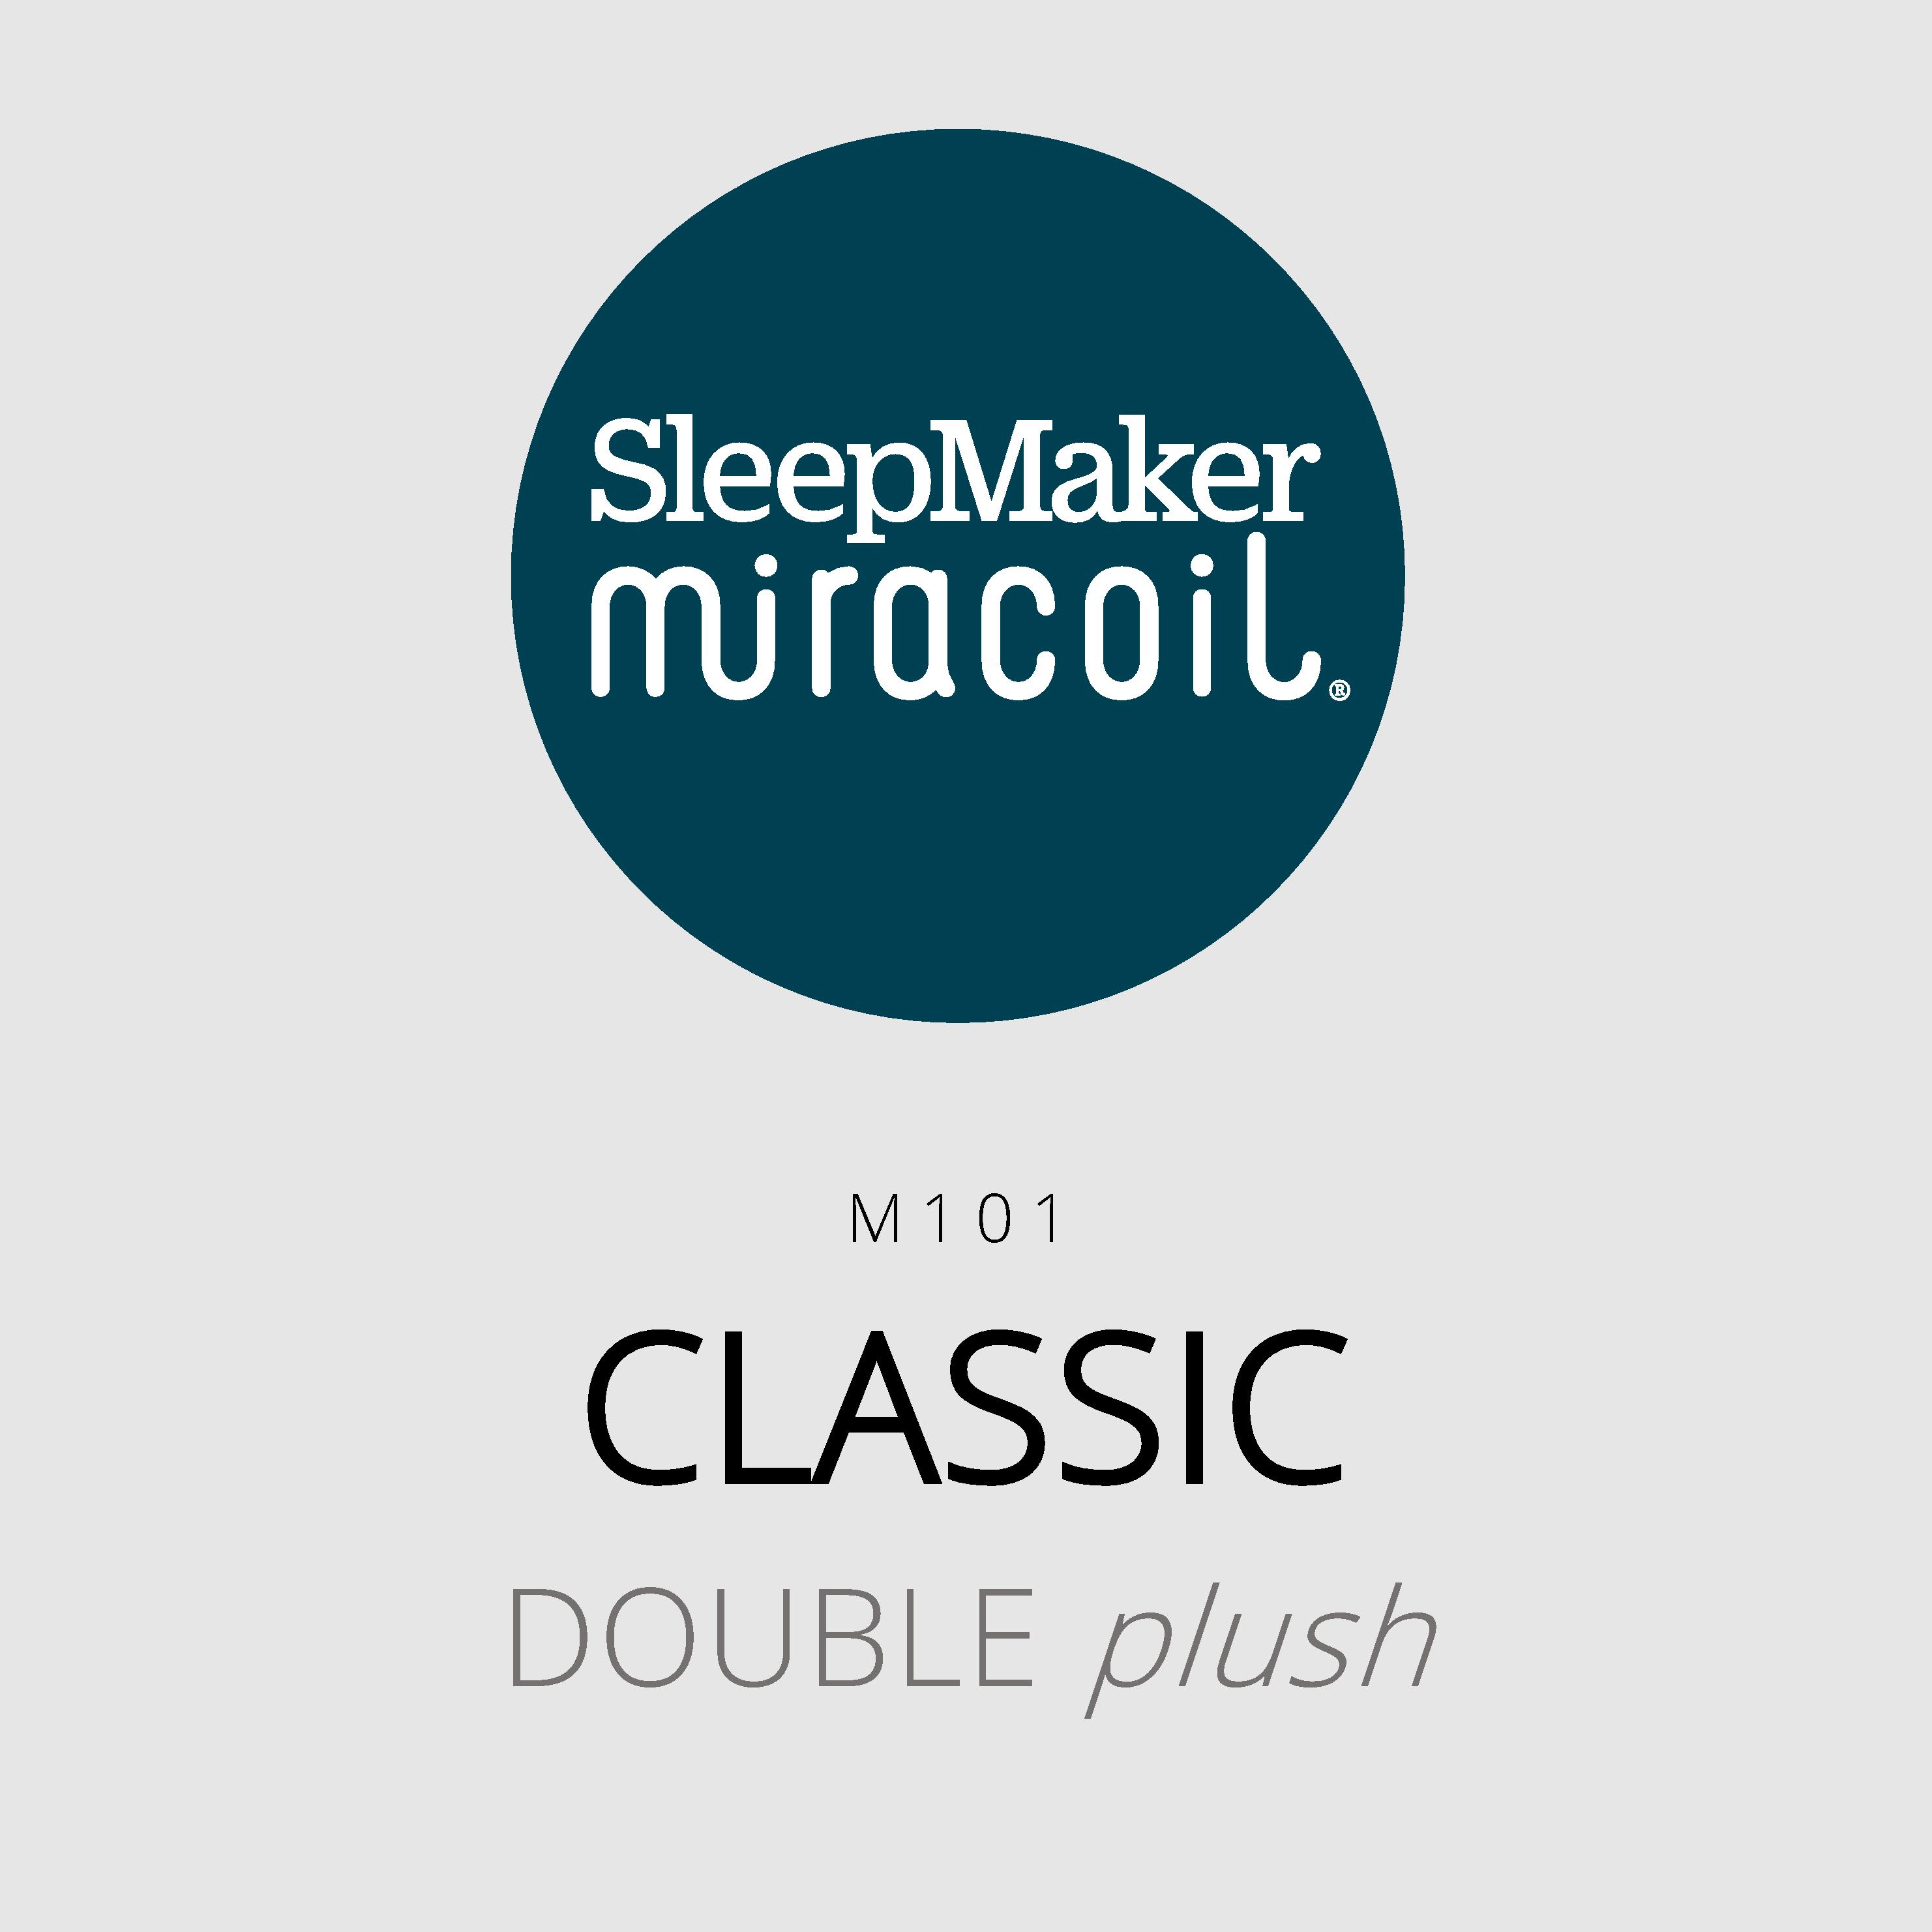 SleepMaker Miracoil – Classic – M101 – Double Plush Mattress